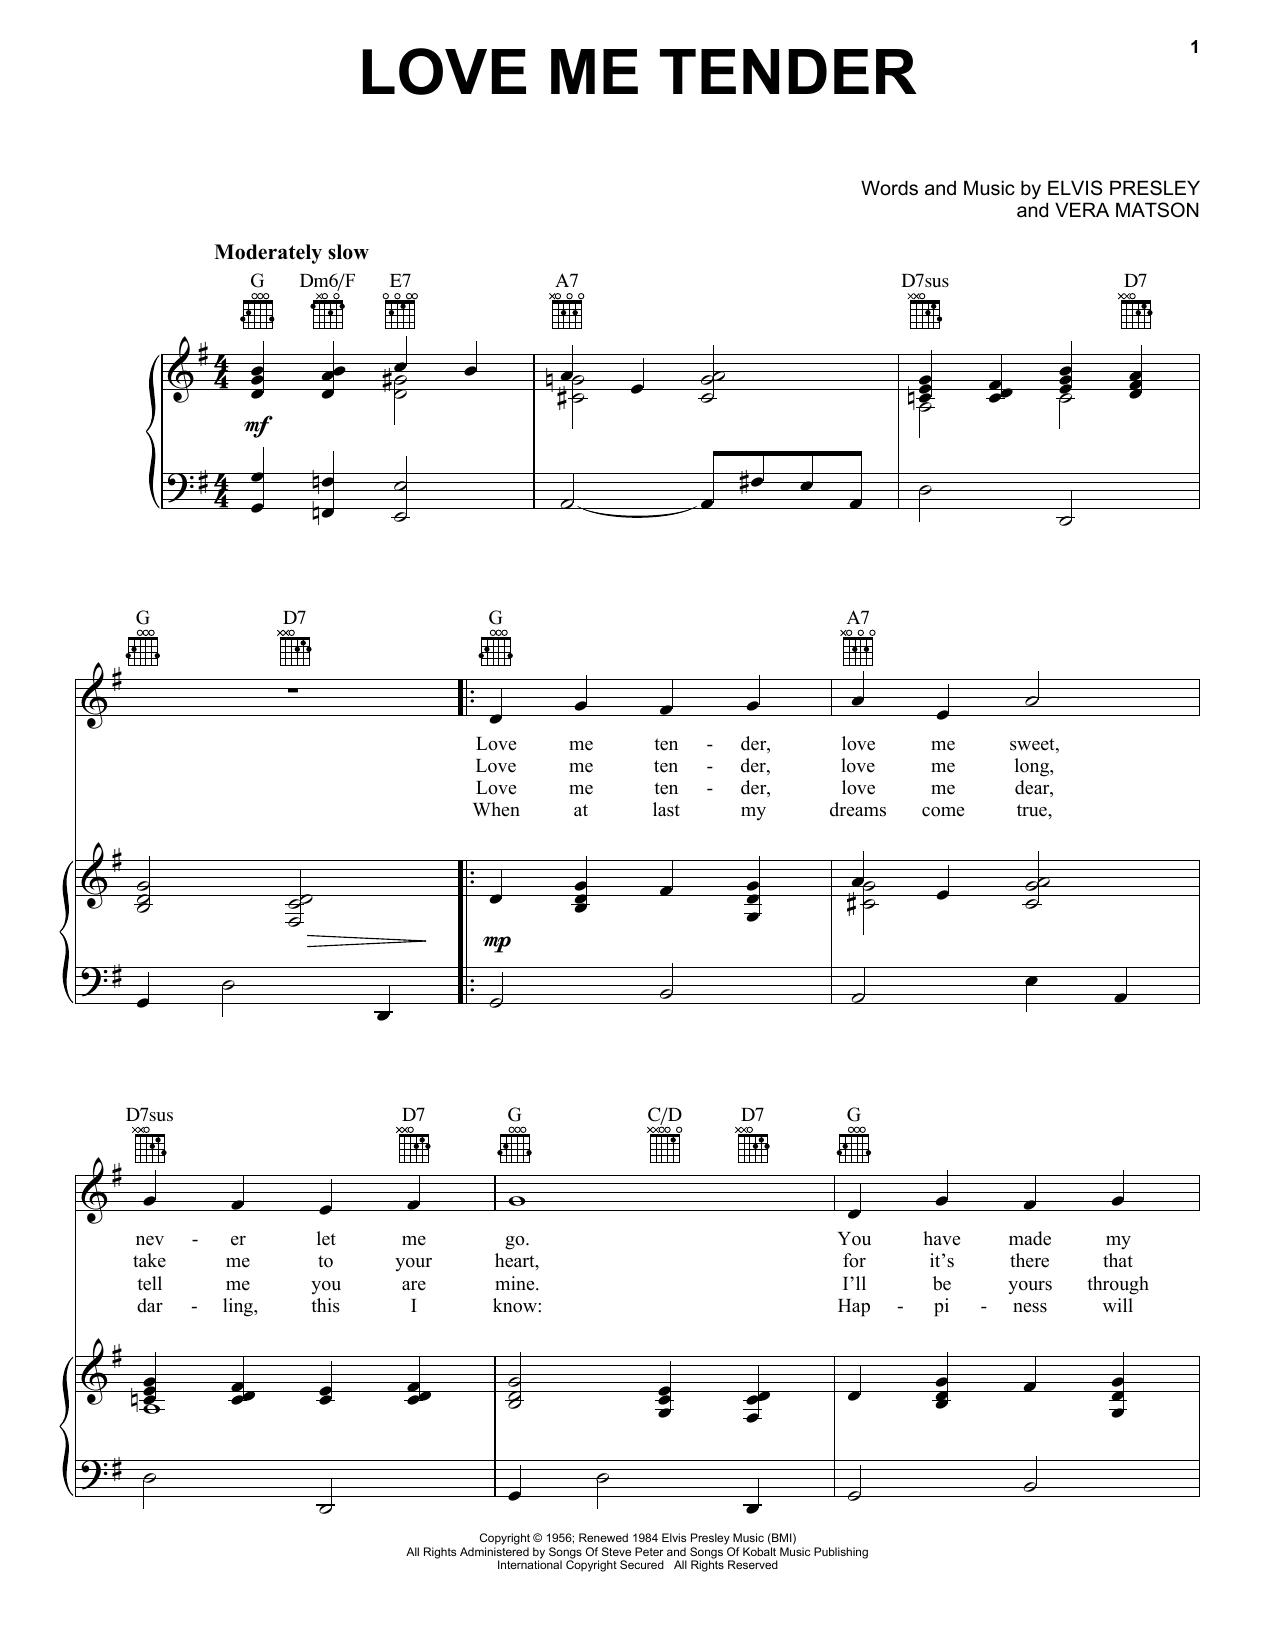 Elvis Presley Love Me Tender sheet music notes and chords